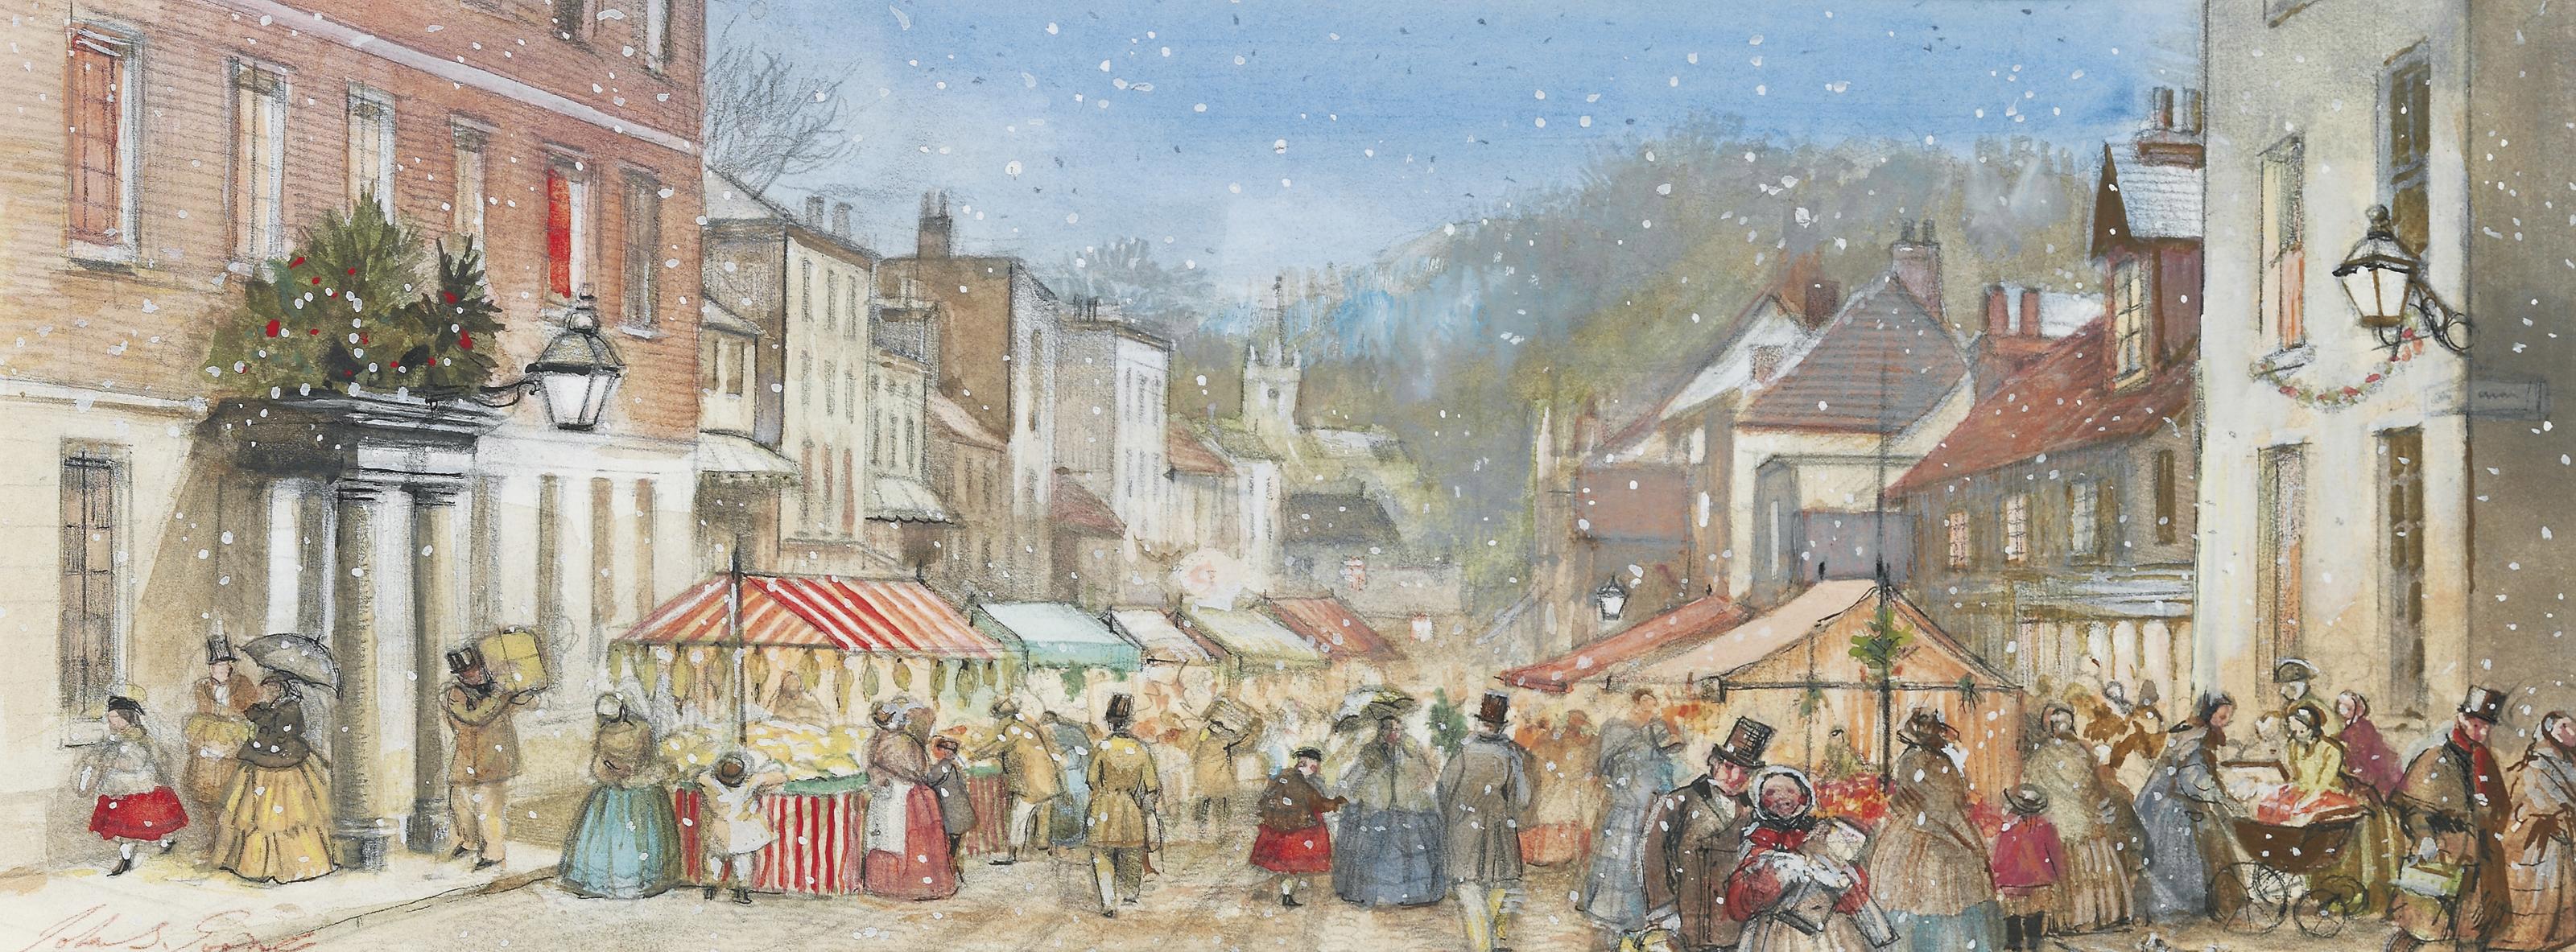 Christmas Shopping on the High Street